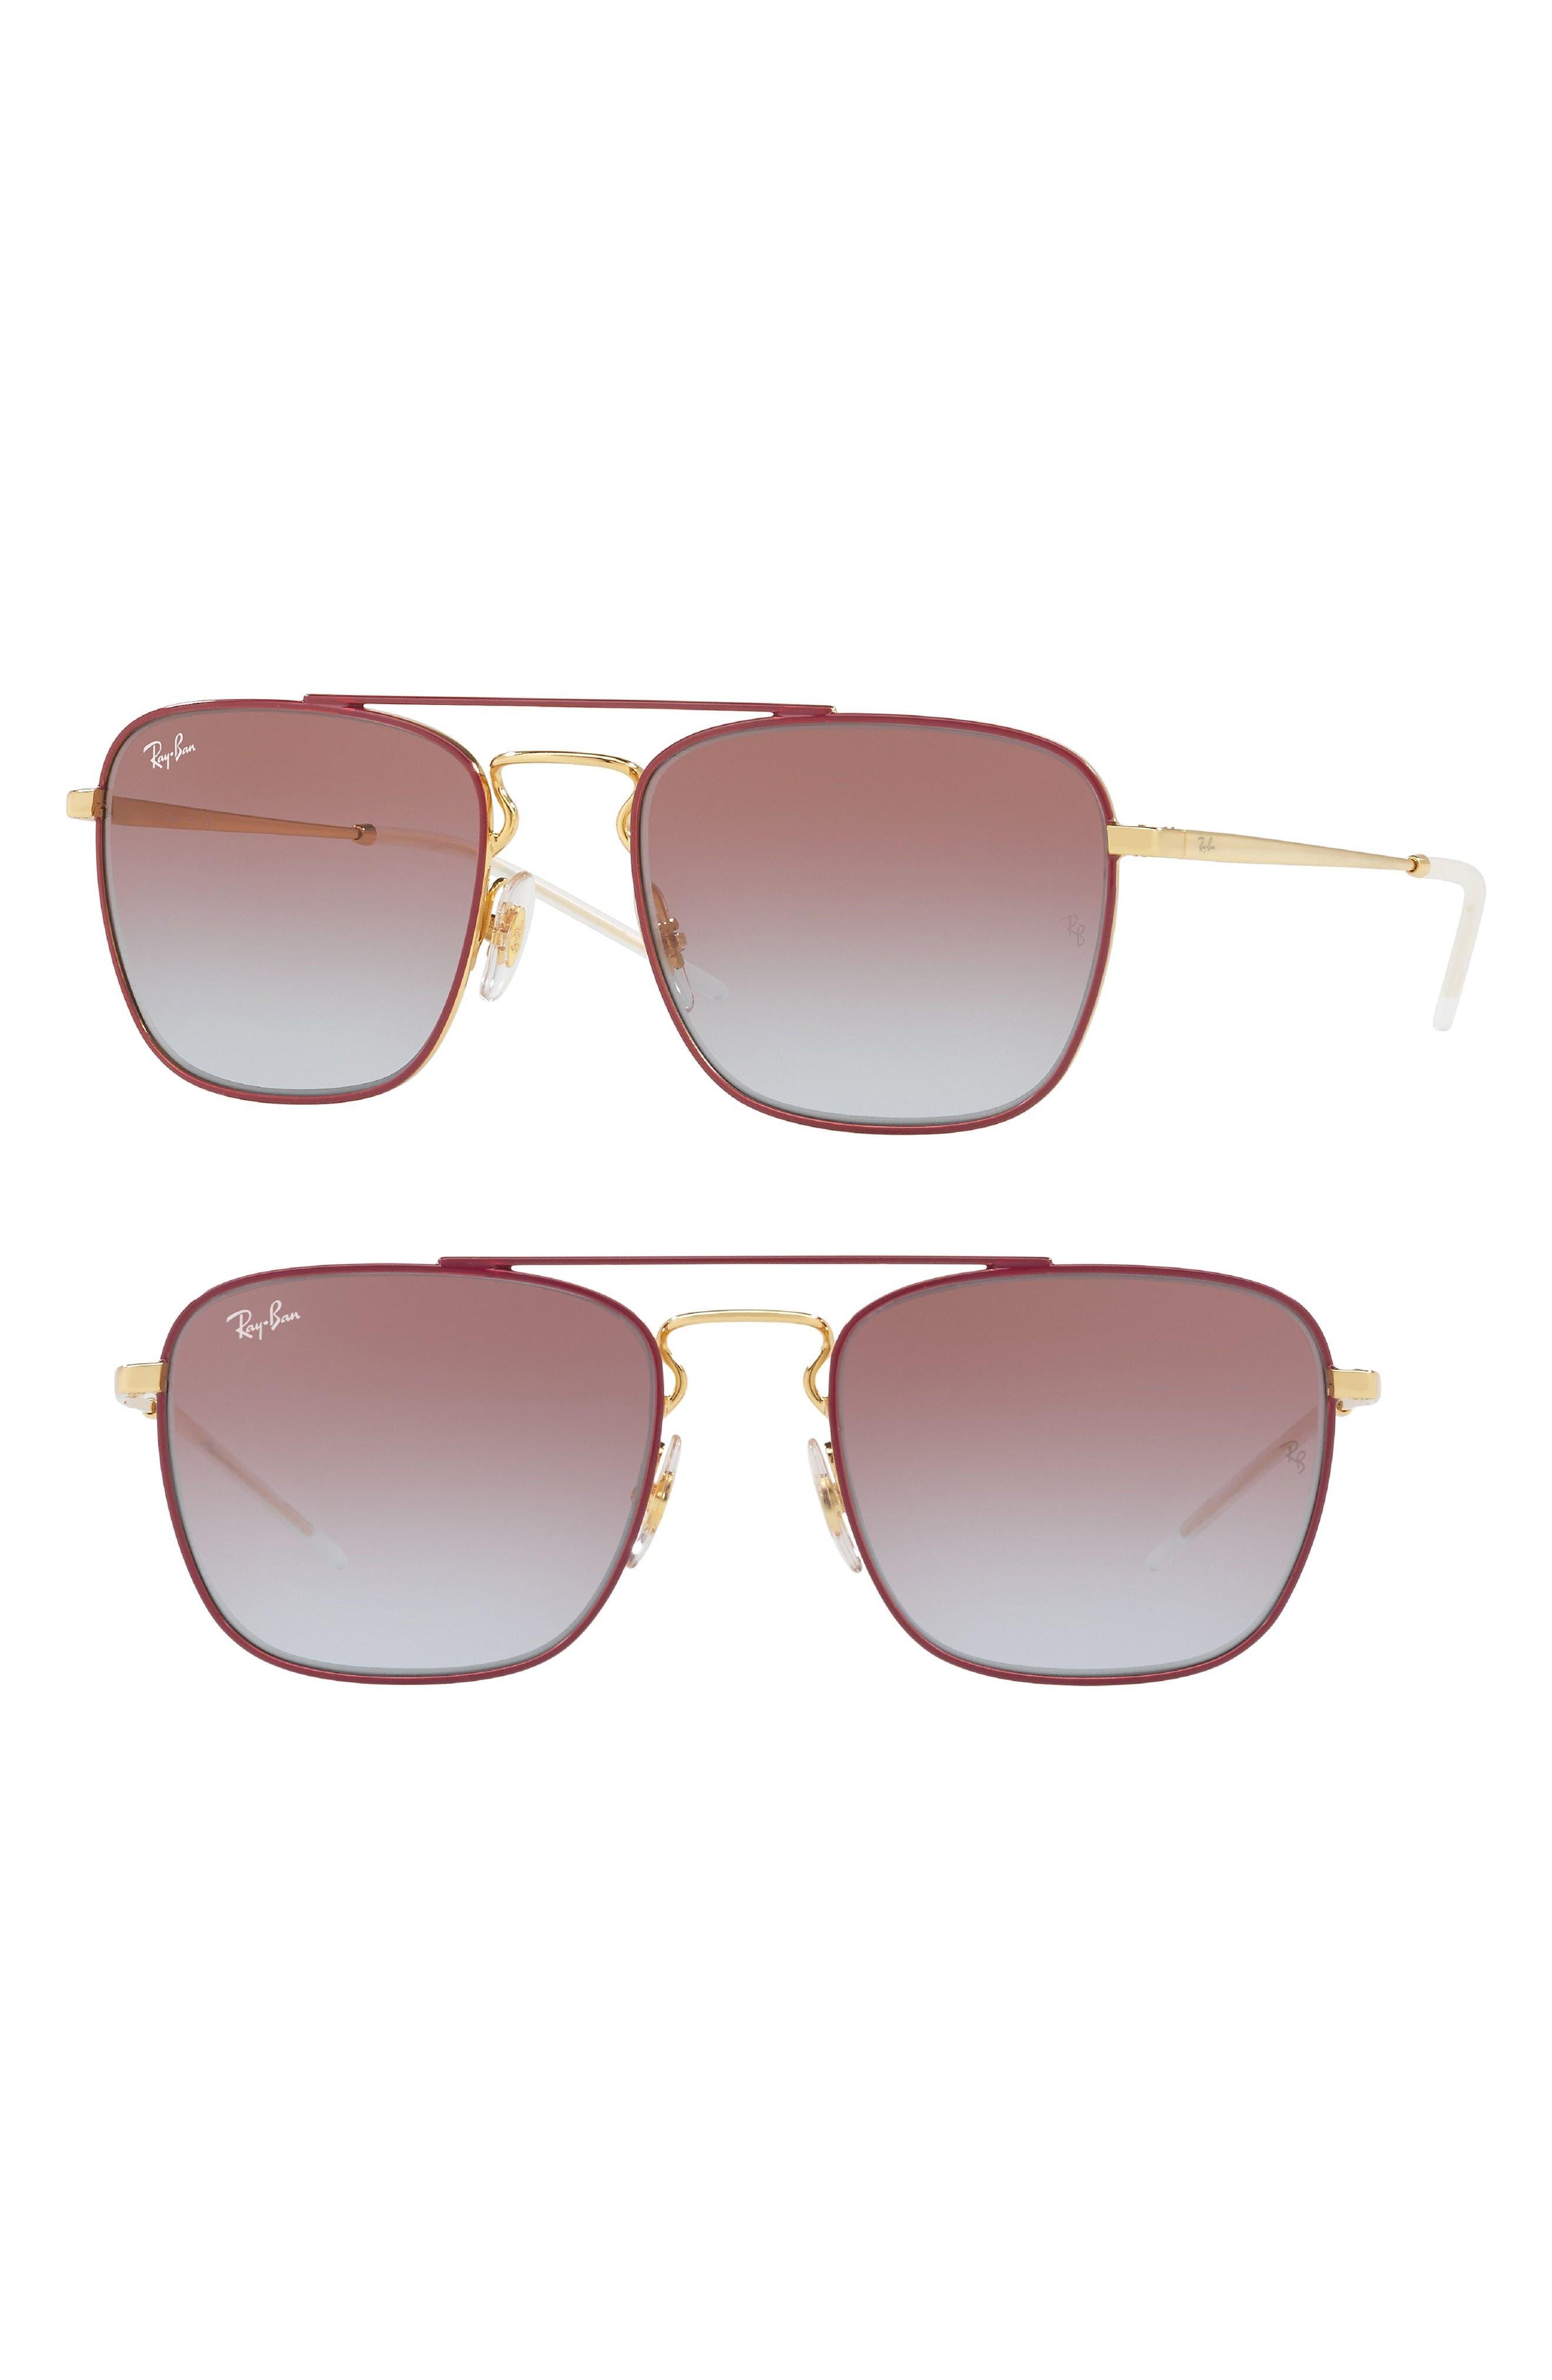 55mm Metal Aviator Sunglasses,                         Main,                         color, Bordeaux